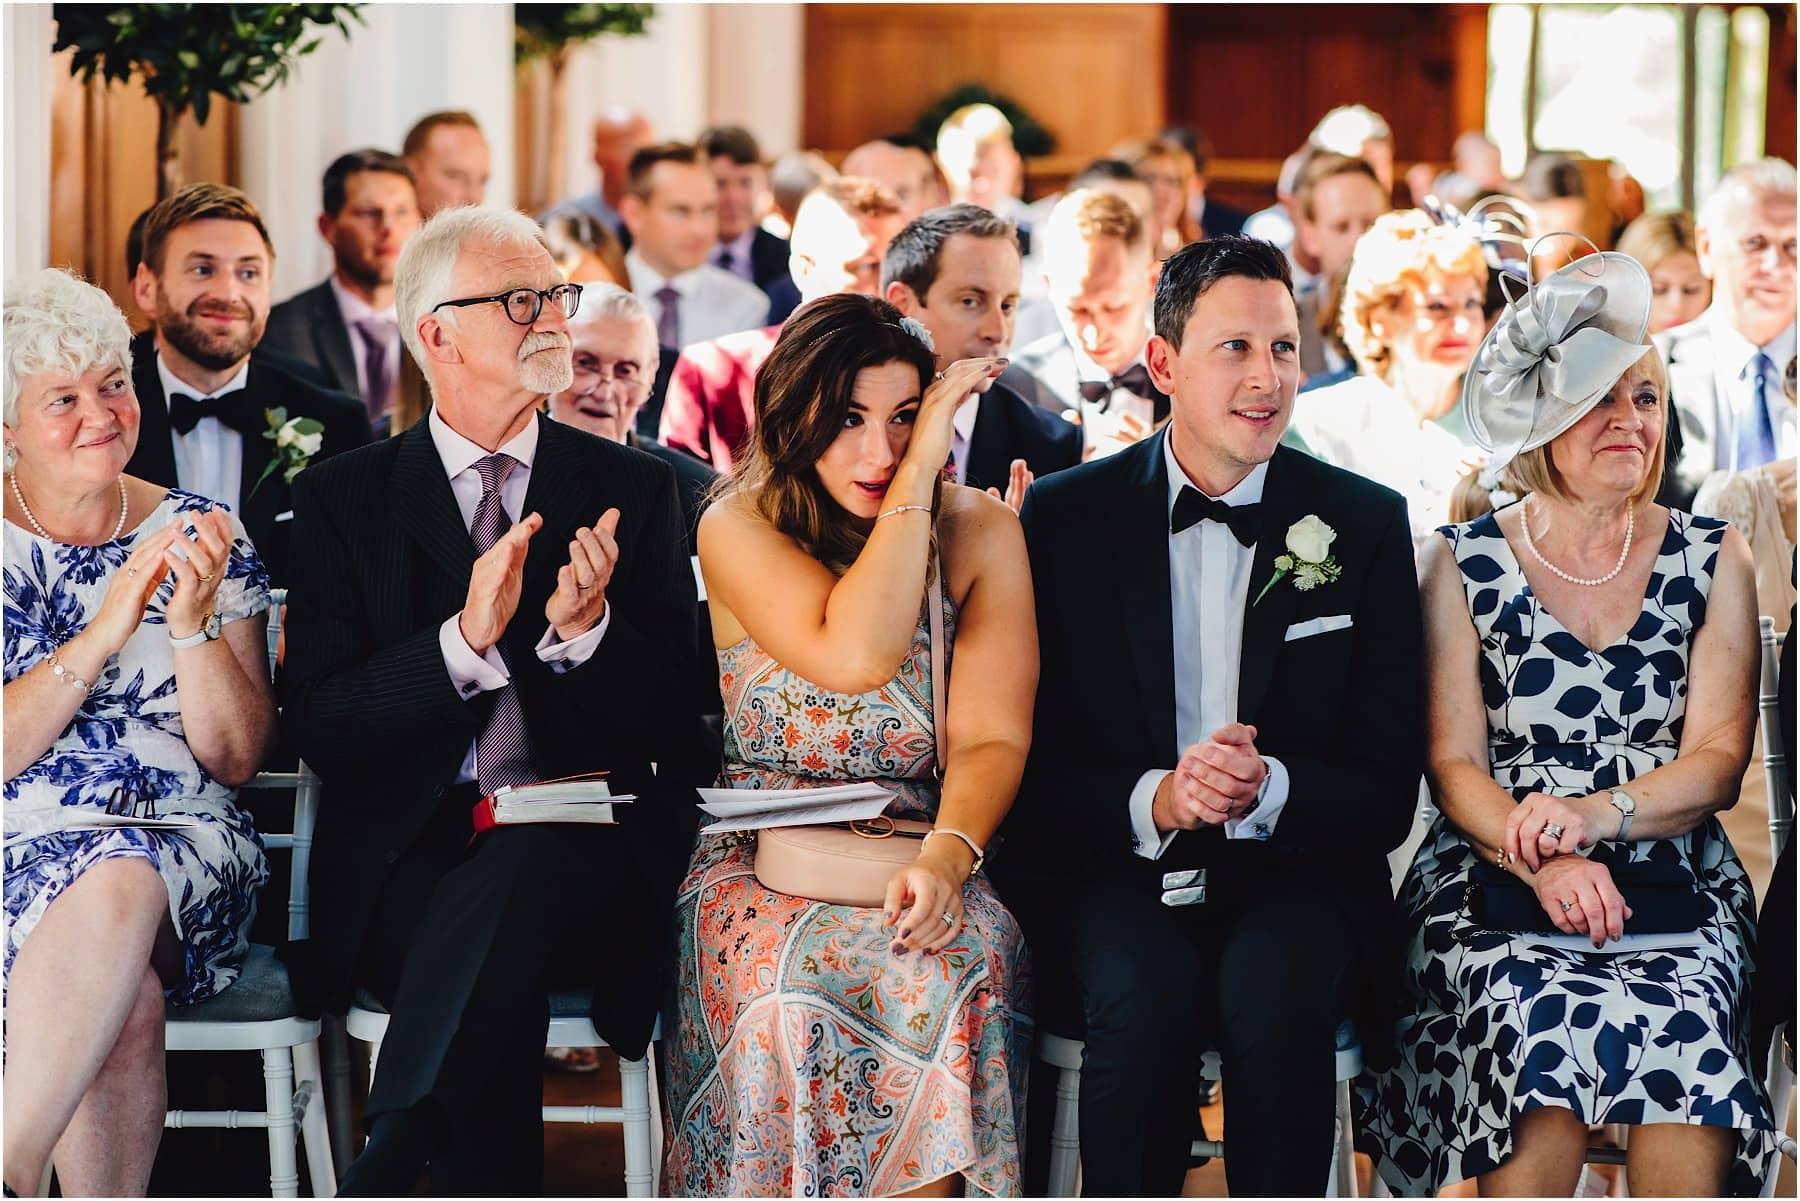 wedding guests getting tearful